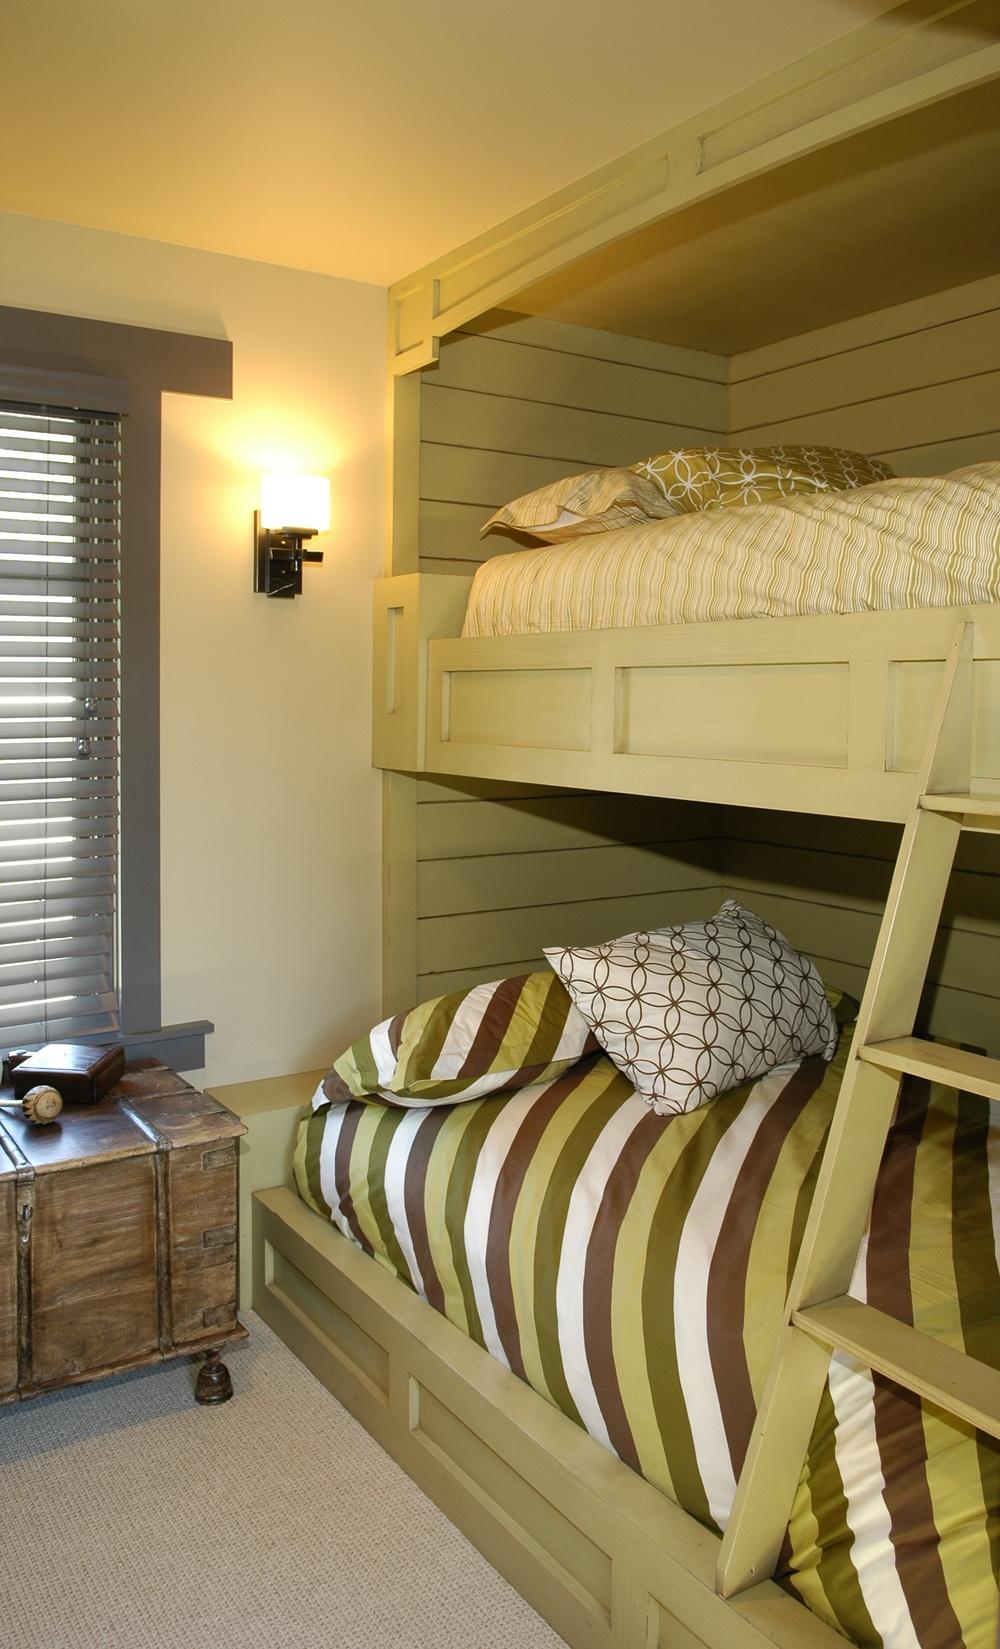 Granger Nash Bunk Room.jpg